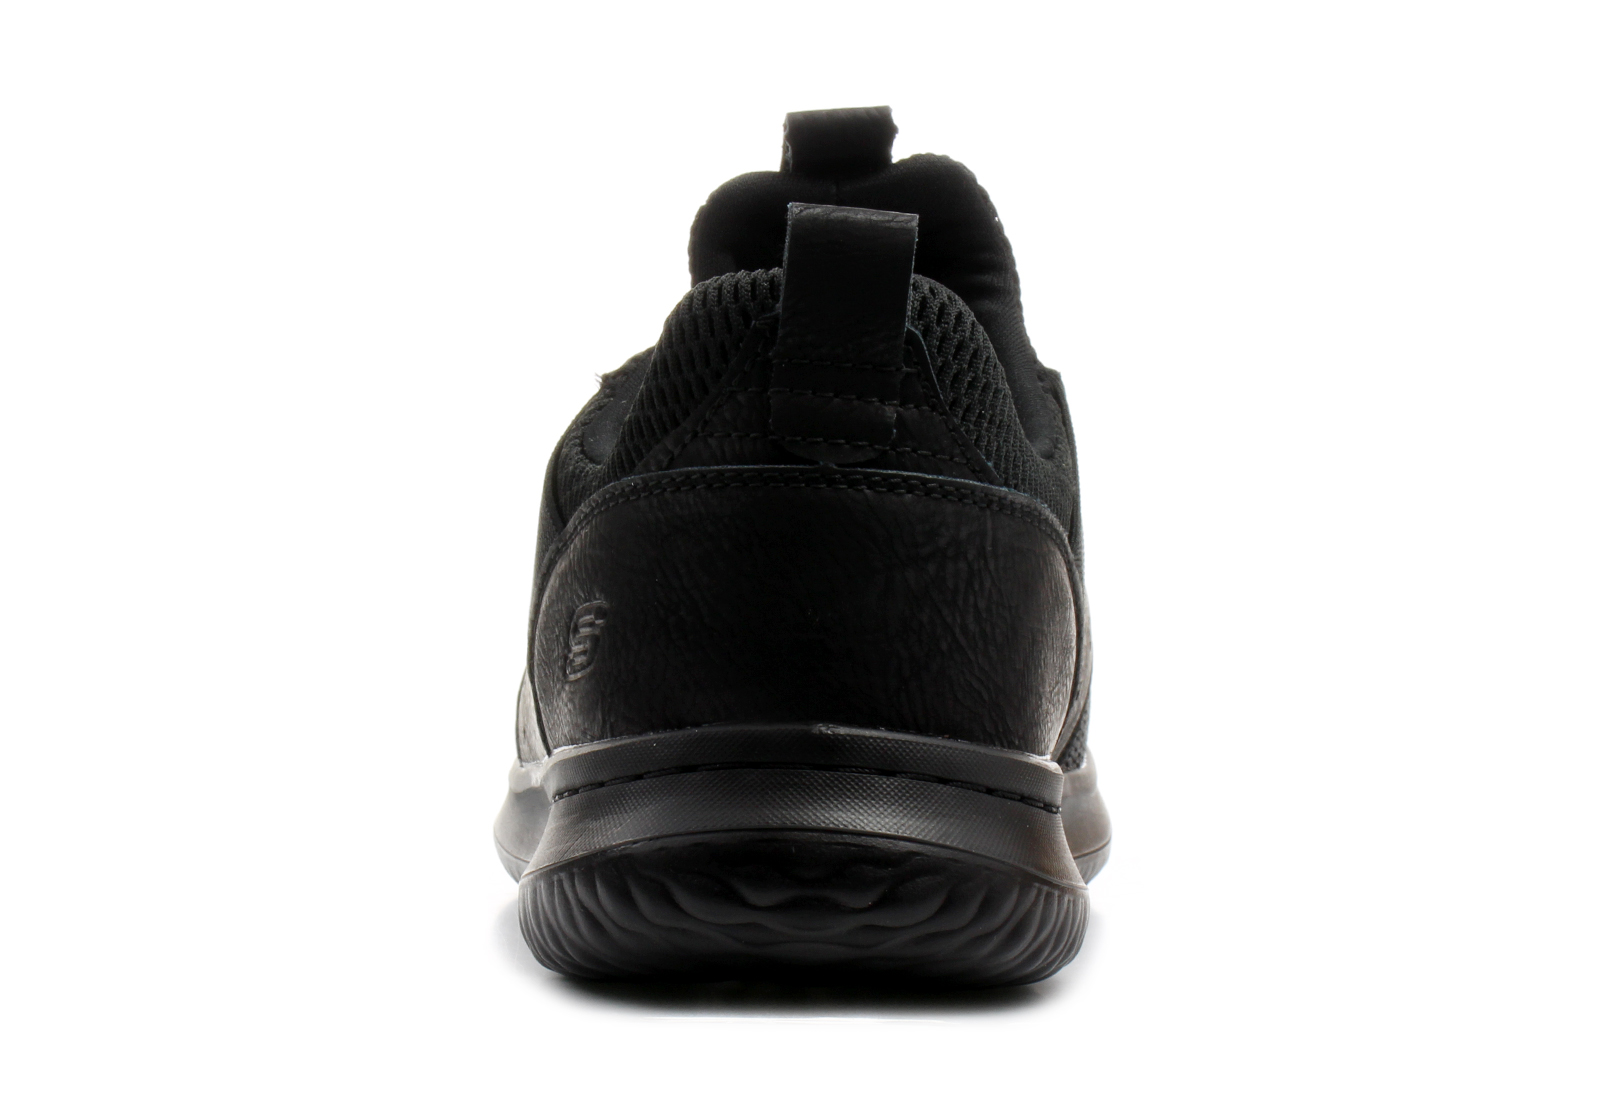 Skechers Cipő - Delson - Camben - 65474-bbk - Office Shoes Magyarország 811e71767a